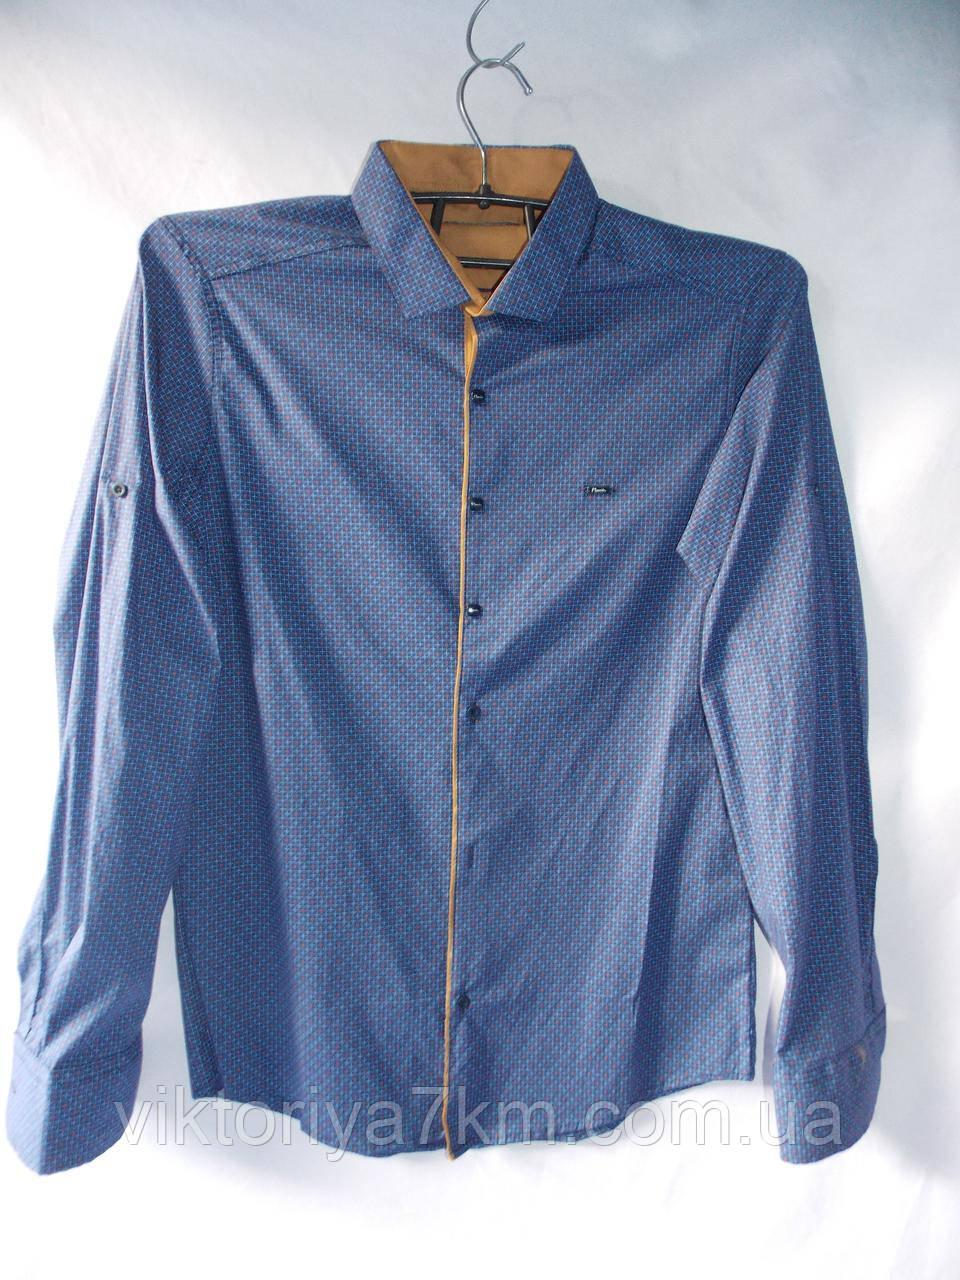 "Рубашка мужская длинный рукав ""Prest"" RS2-5034"